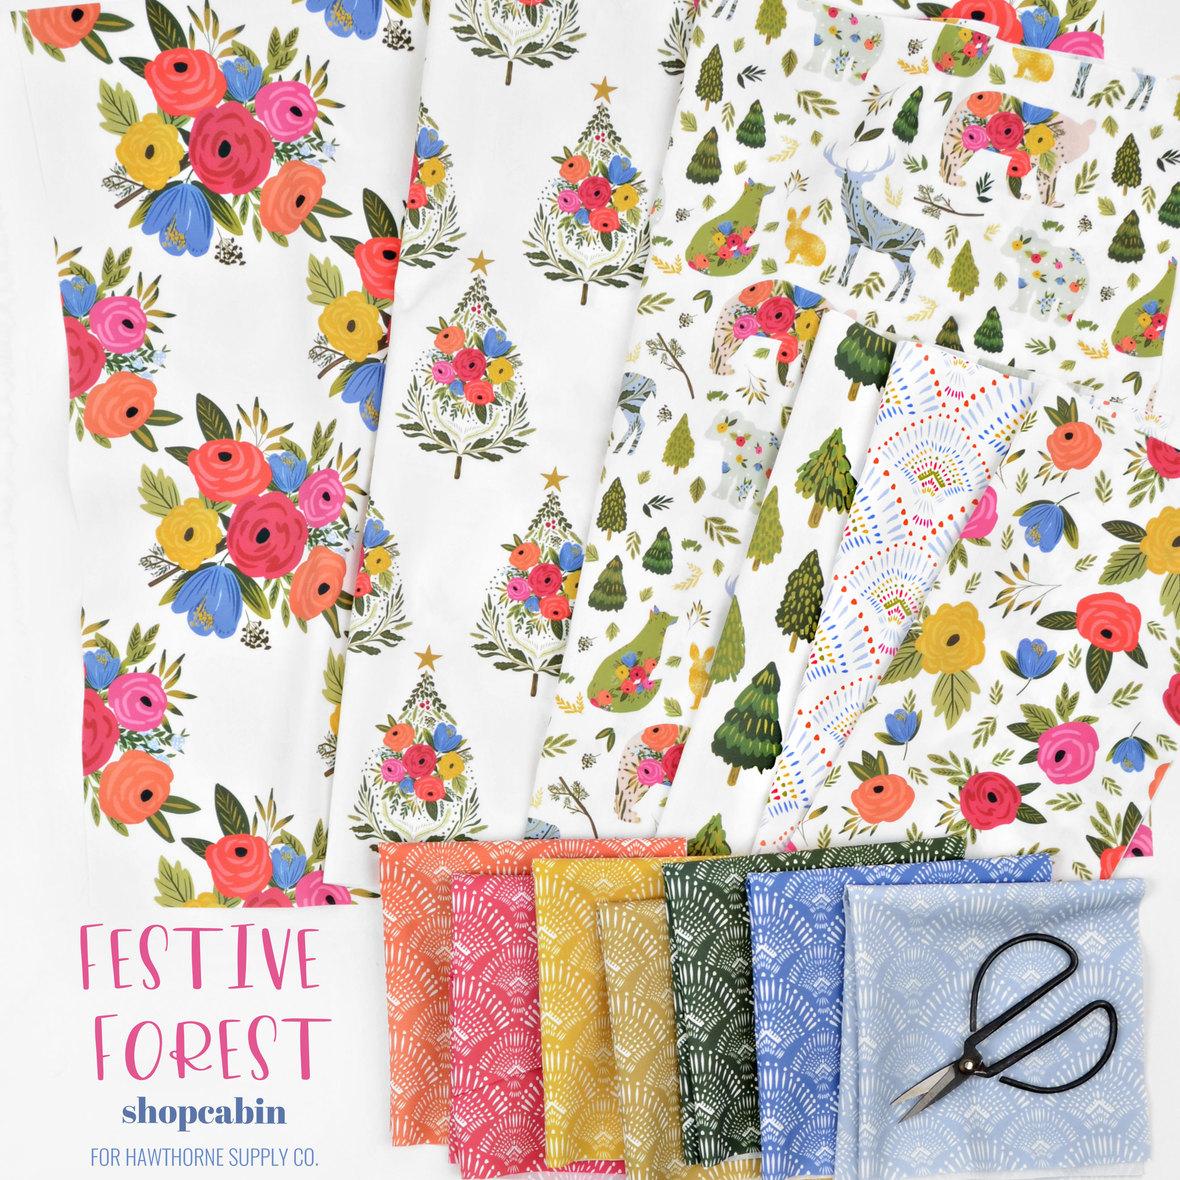 B-Festive-Forest-Fabric-Shopcabin-at-Hawthorne-Supply-Co